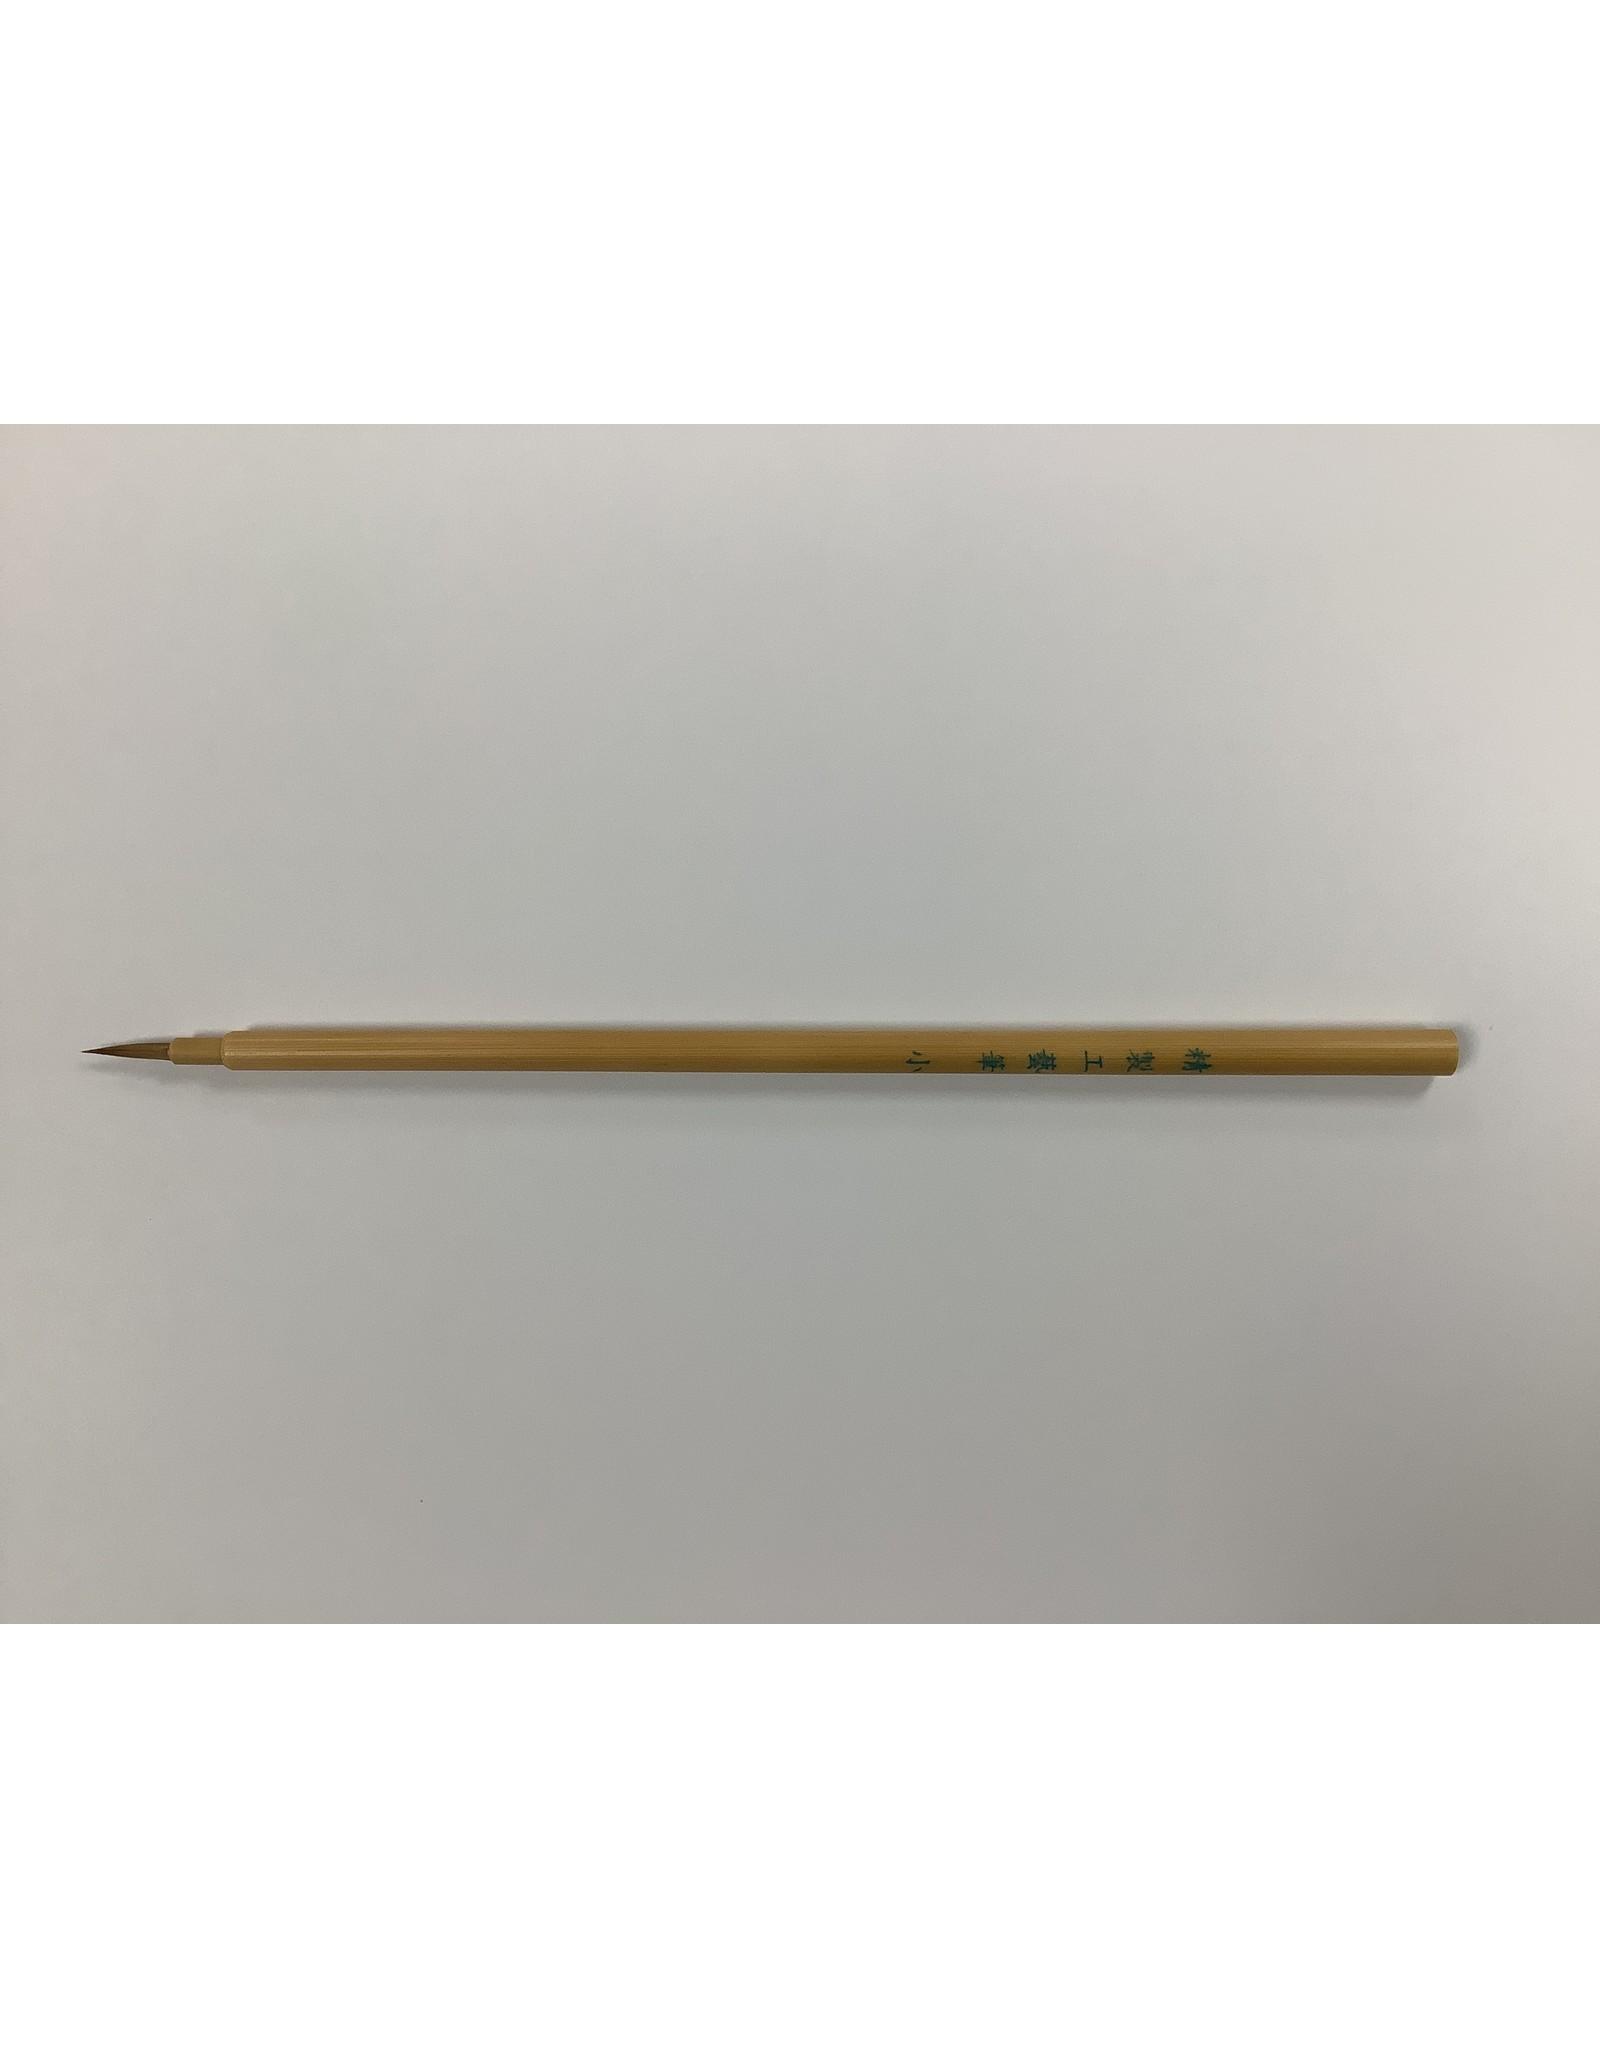 Seven Skill Chinese Liner Brush